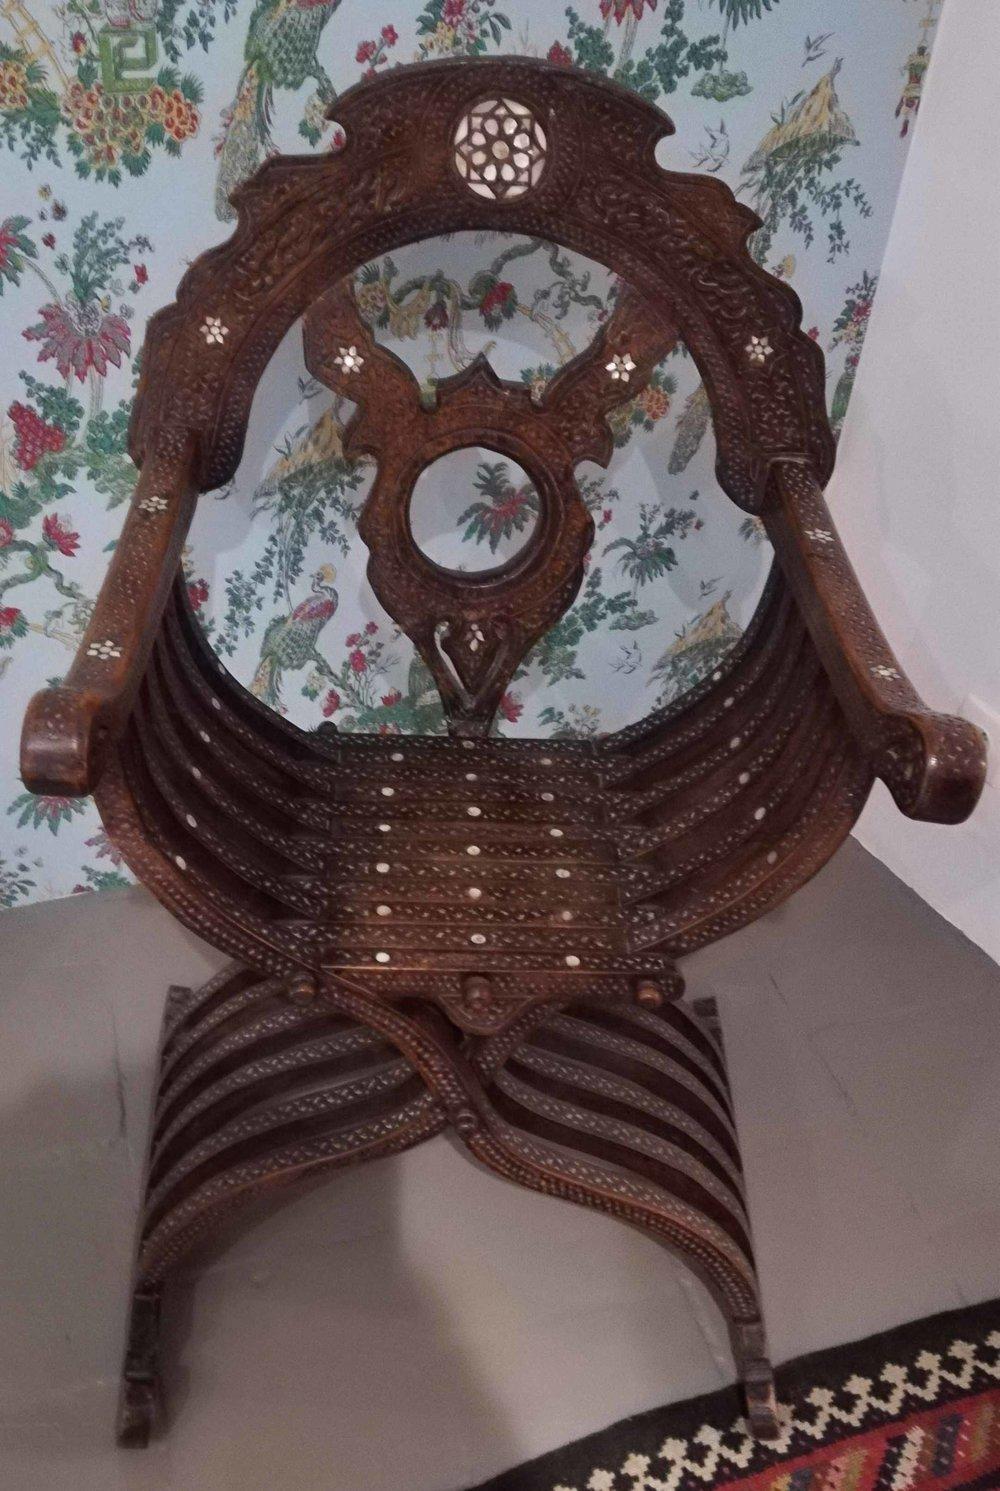 item 4: Ottoman Syrian mother of pearl inlaid Savonarola chair